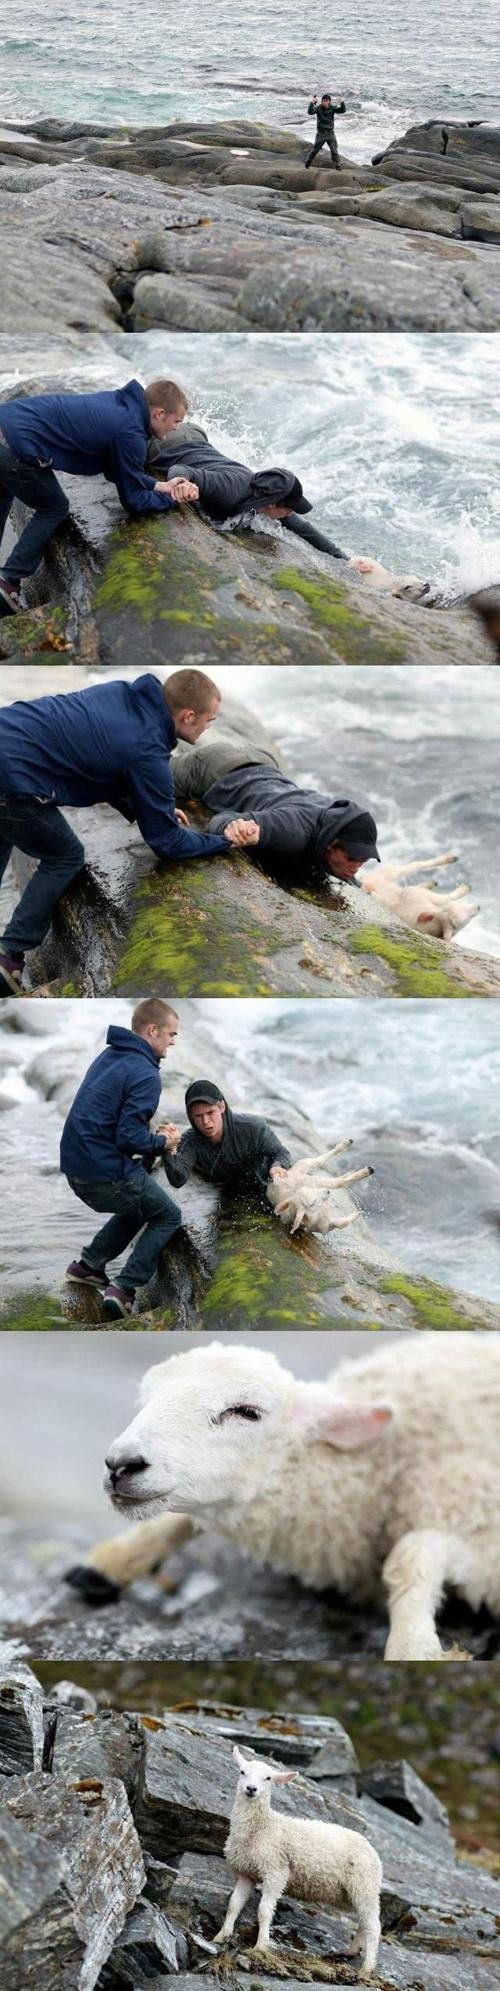 guys rescuing a sheep